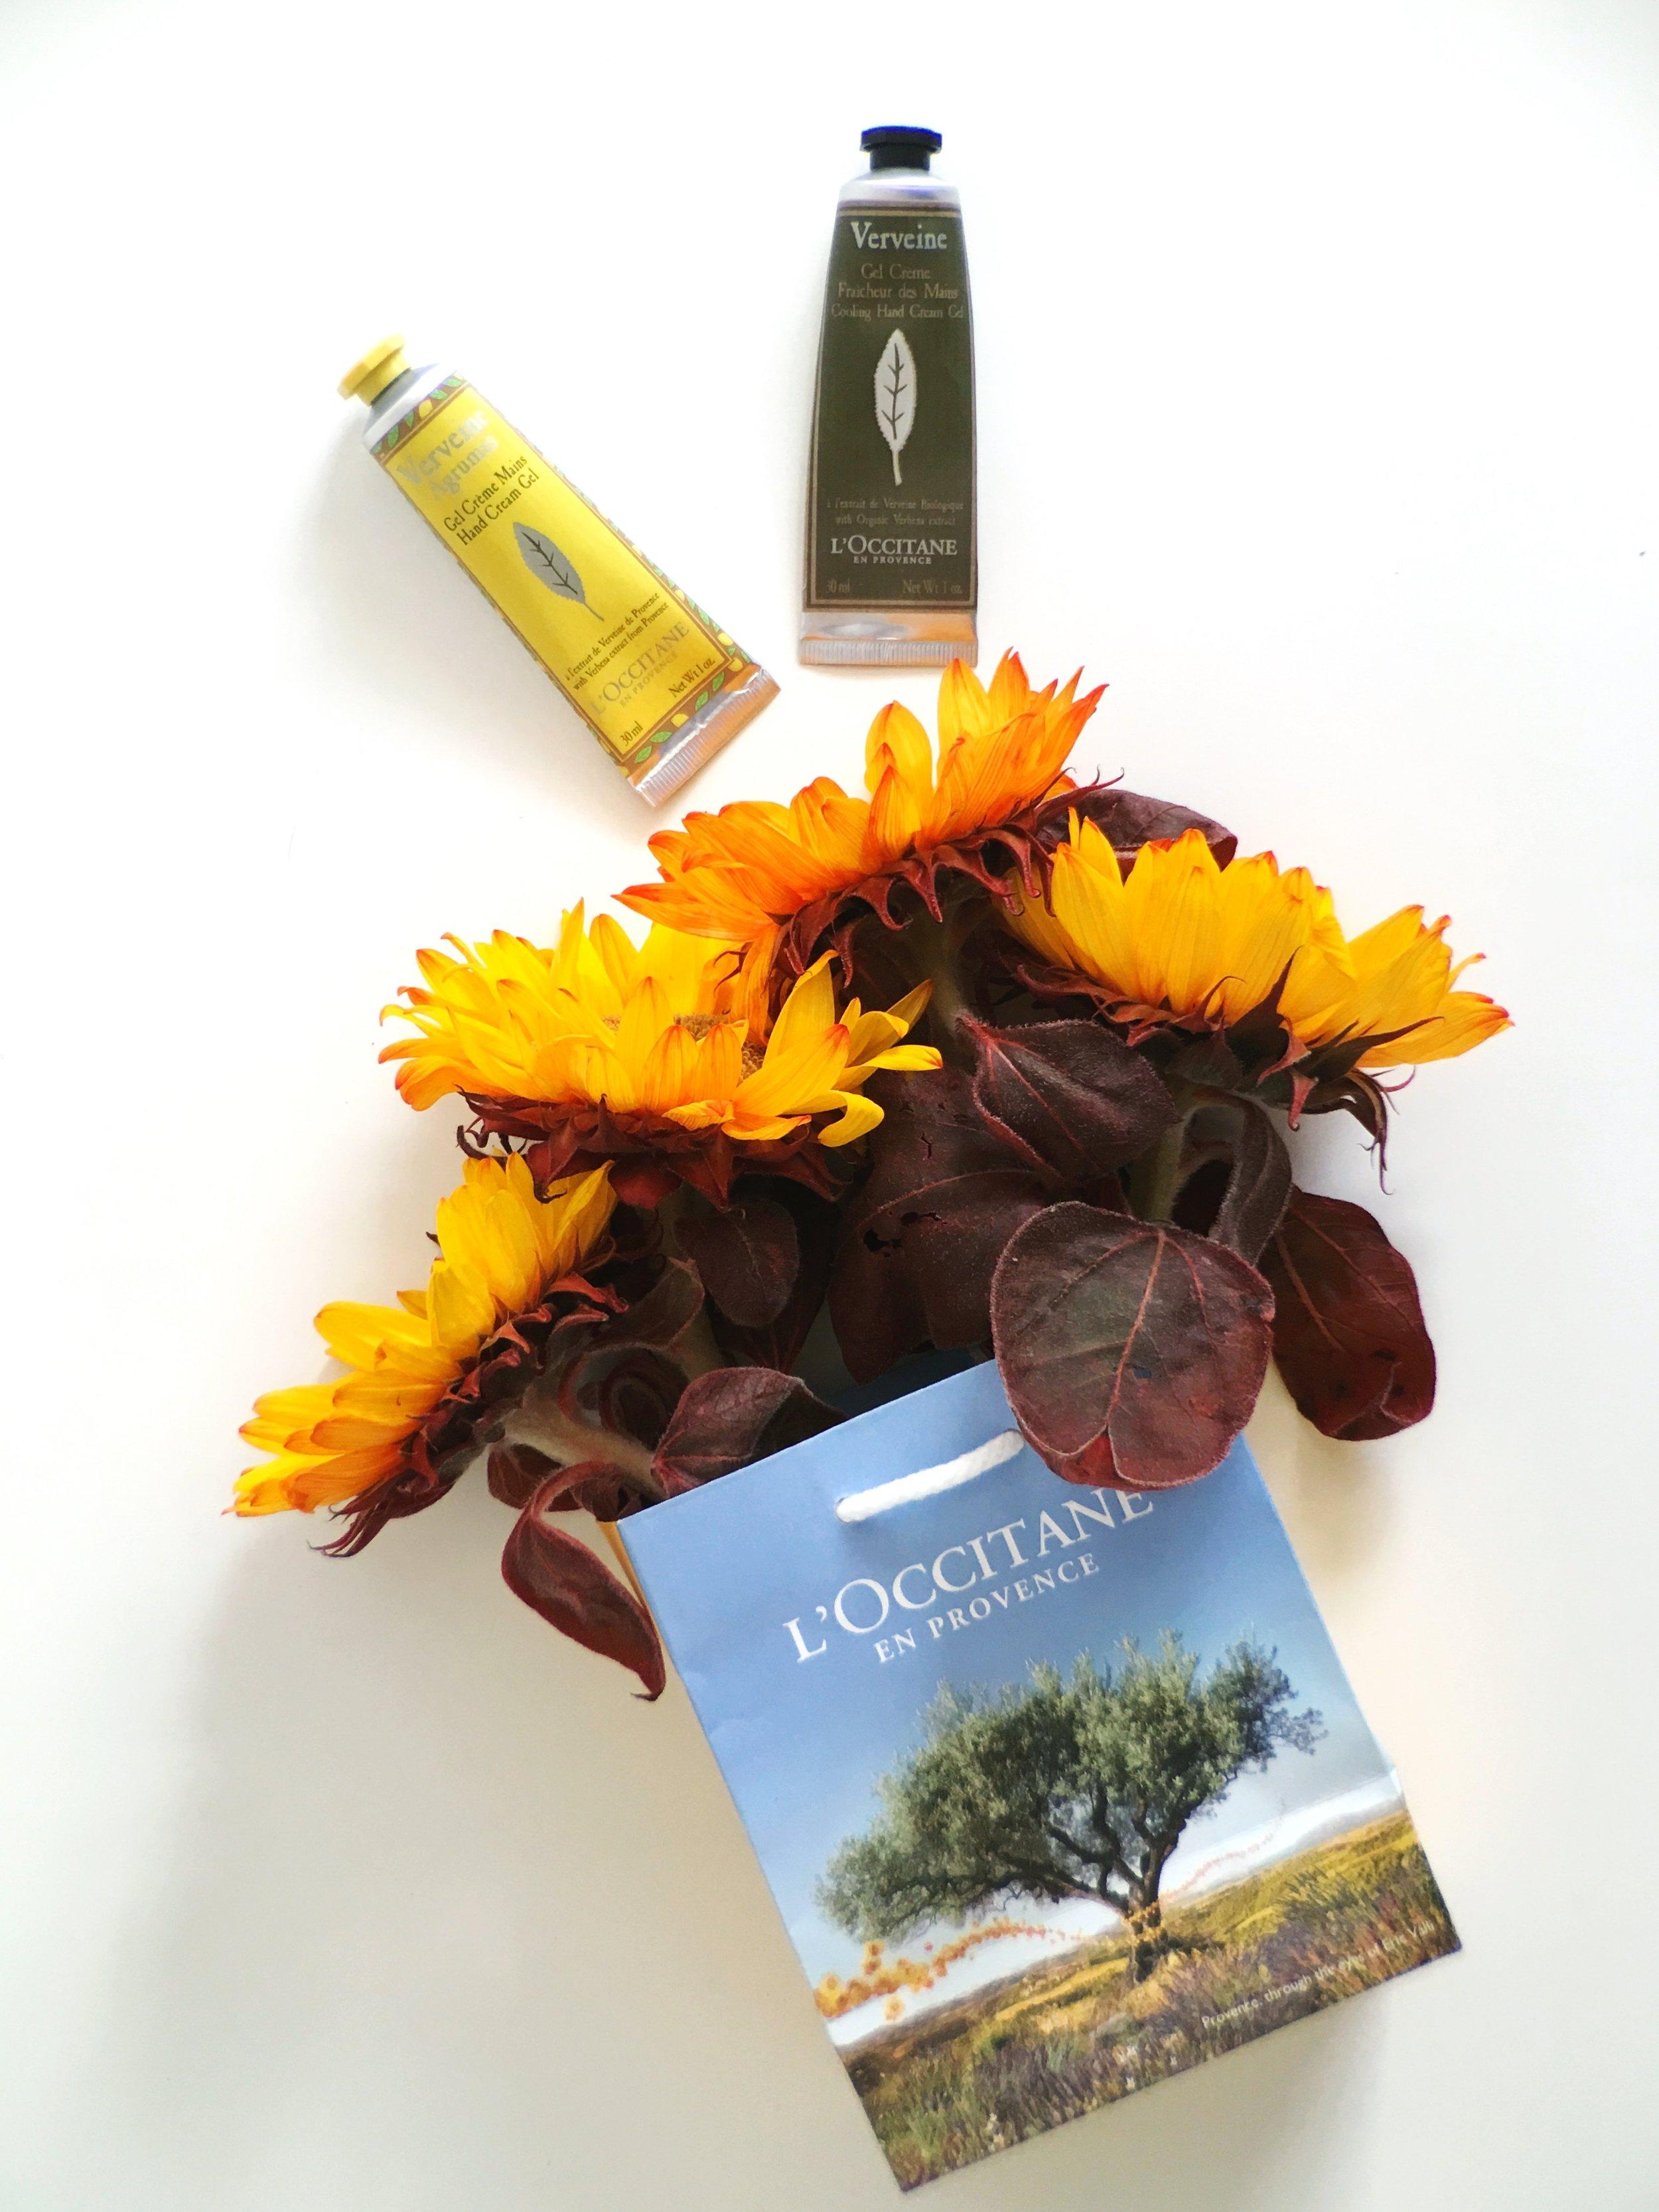 Yellow Sunflowers with L'Occitane Hand gel cream in Verviene/ Citrusy scents